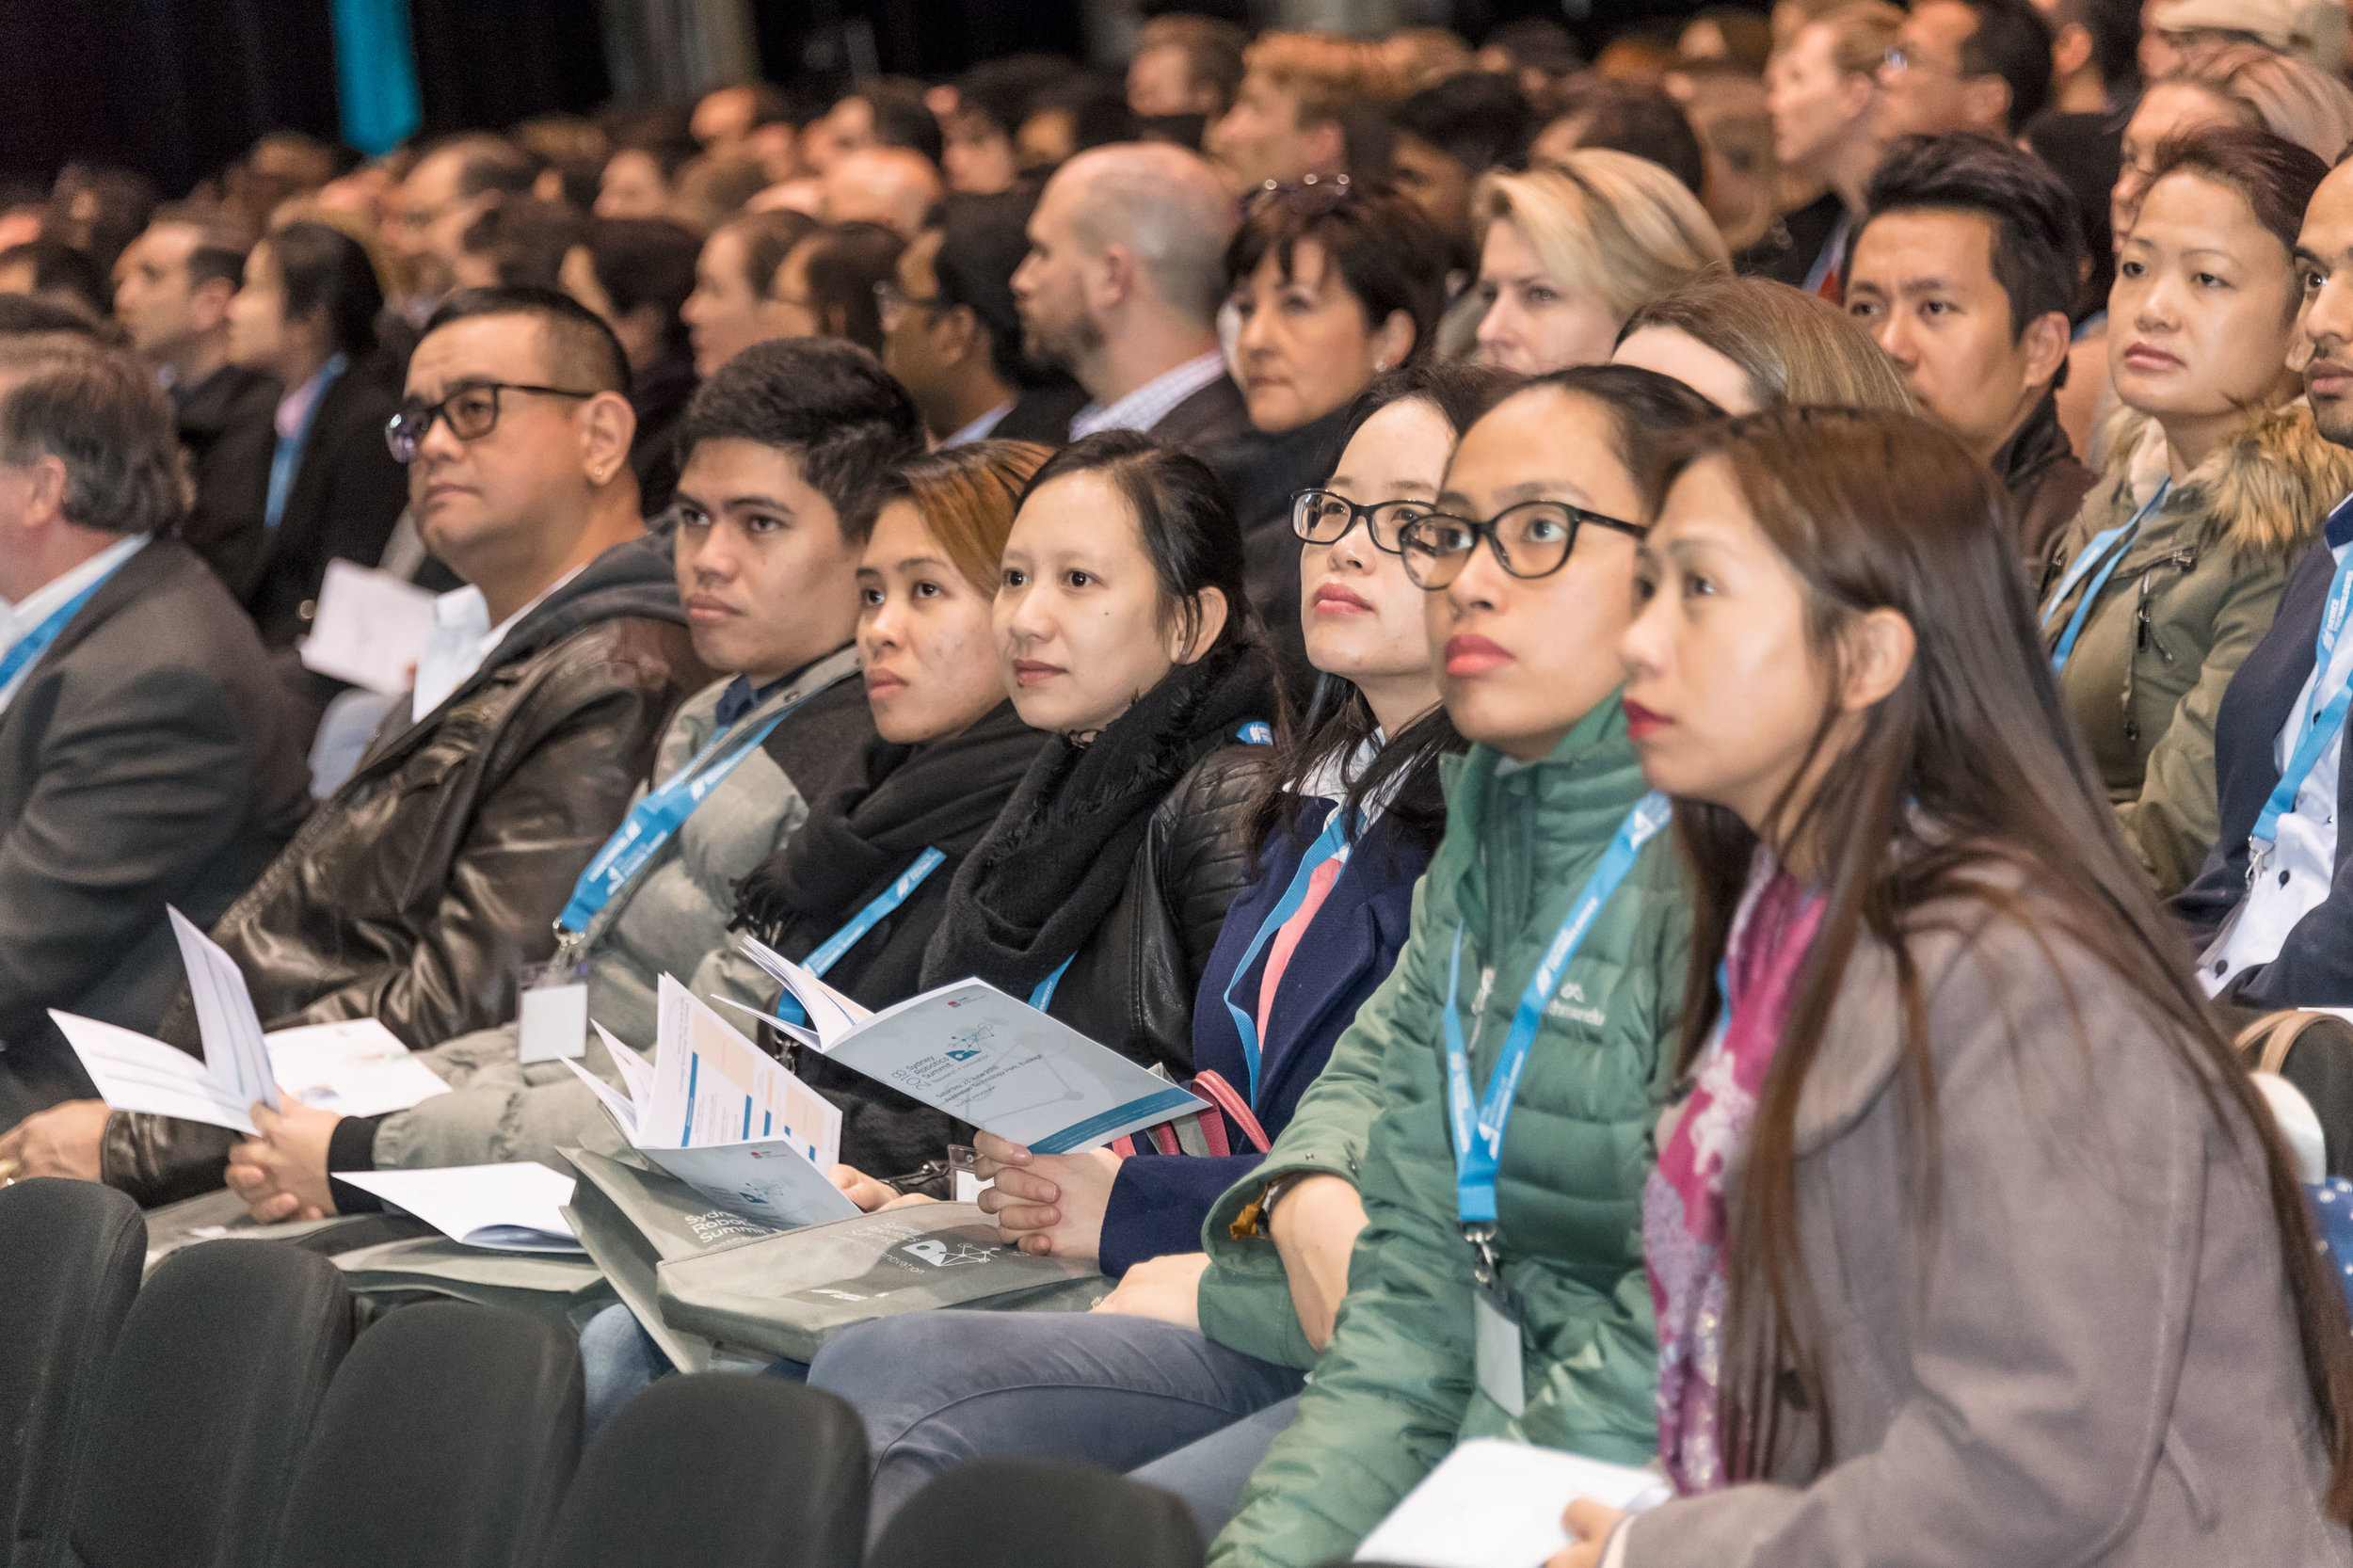 83342 Robotic Symposium Sat 20180623 WS1 Pro_171364.jpg